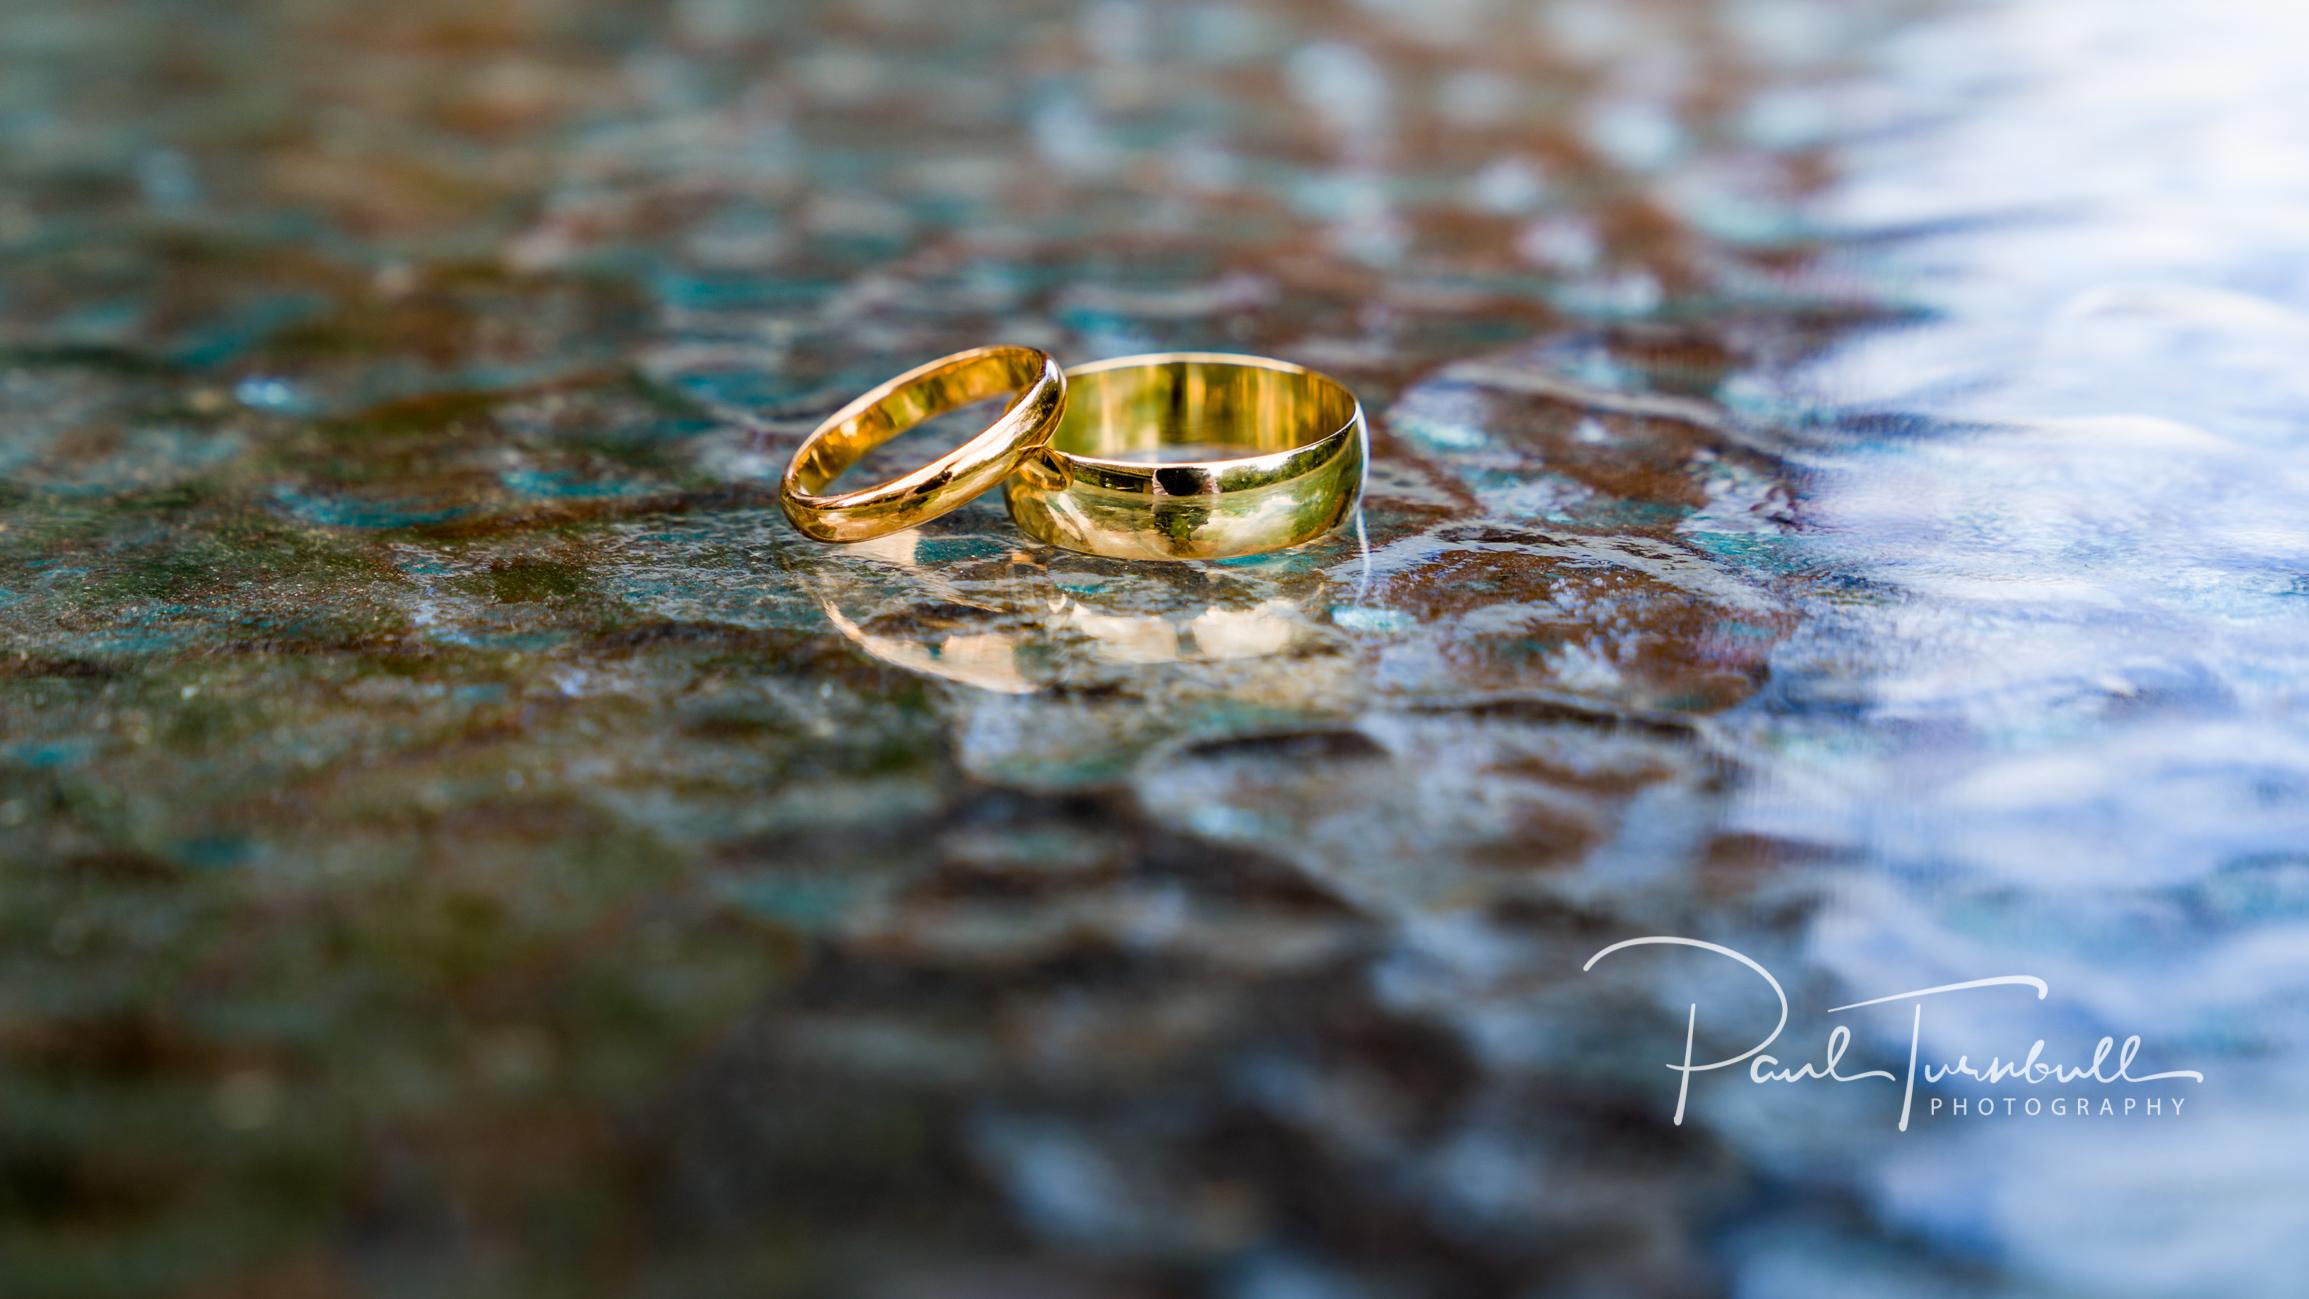 wedding-photographer-south-dalton-walkington-yorkshire-emma-james-019.jpg